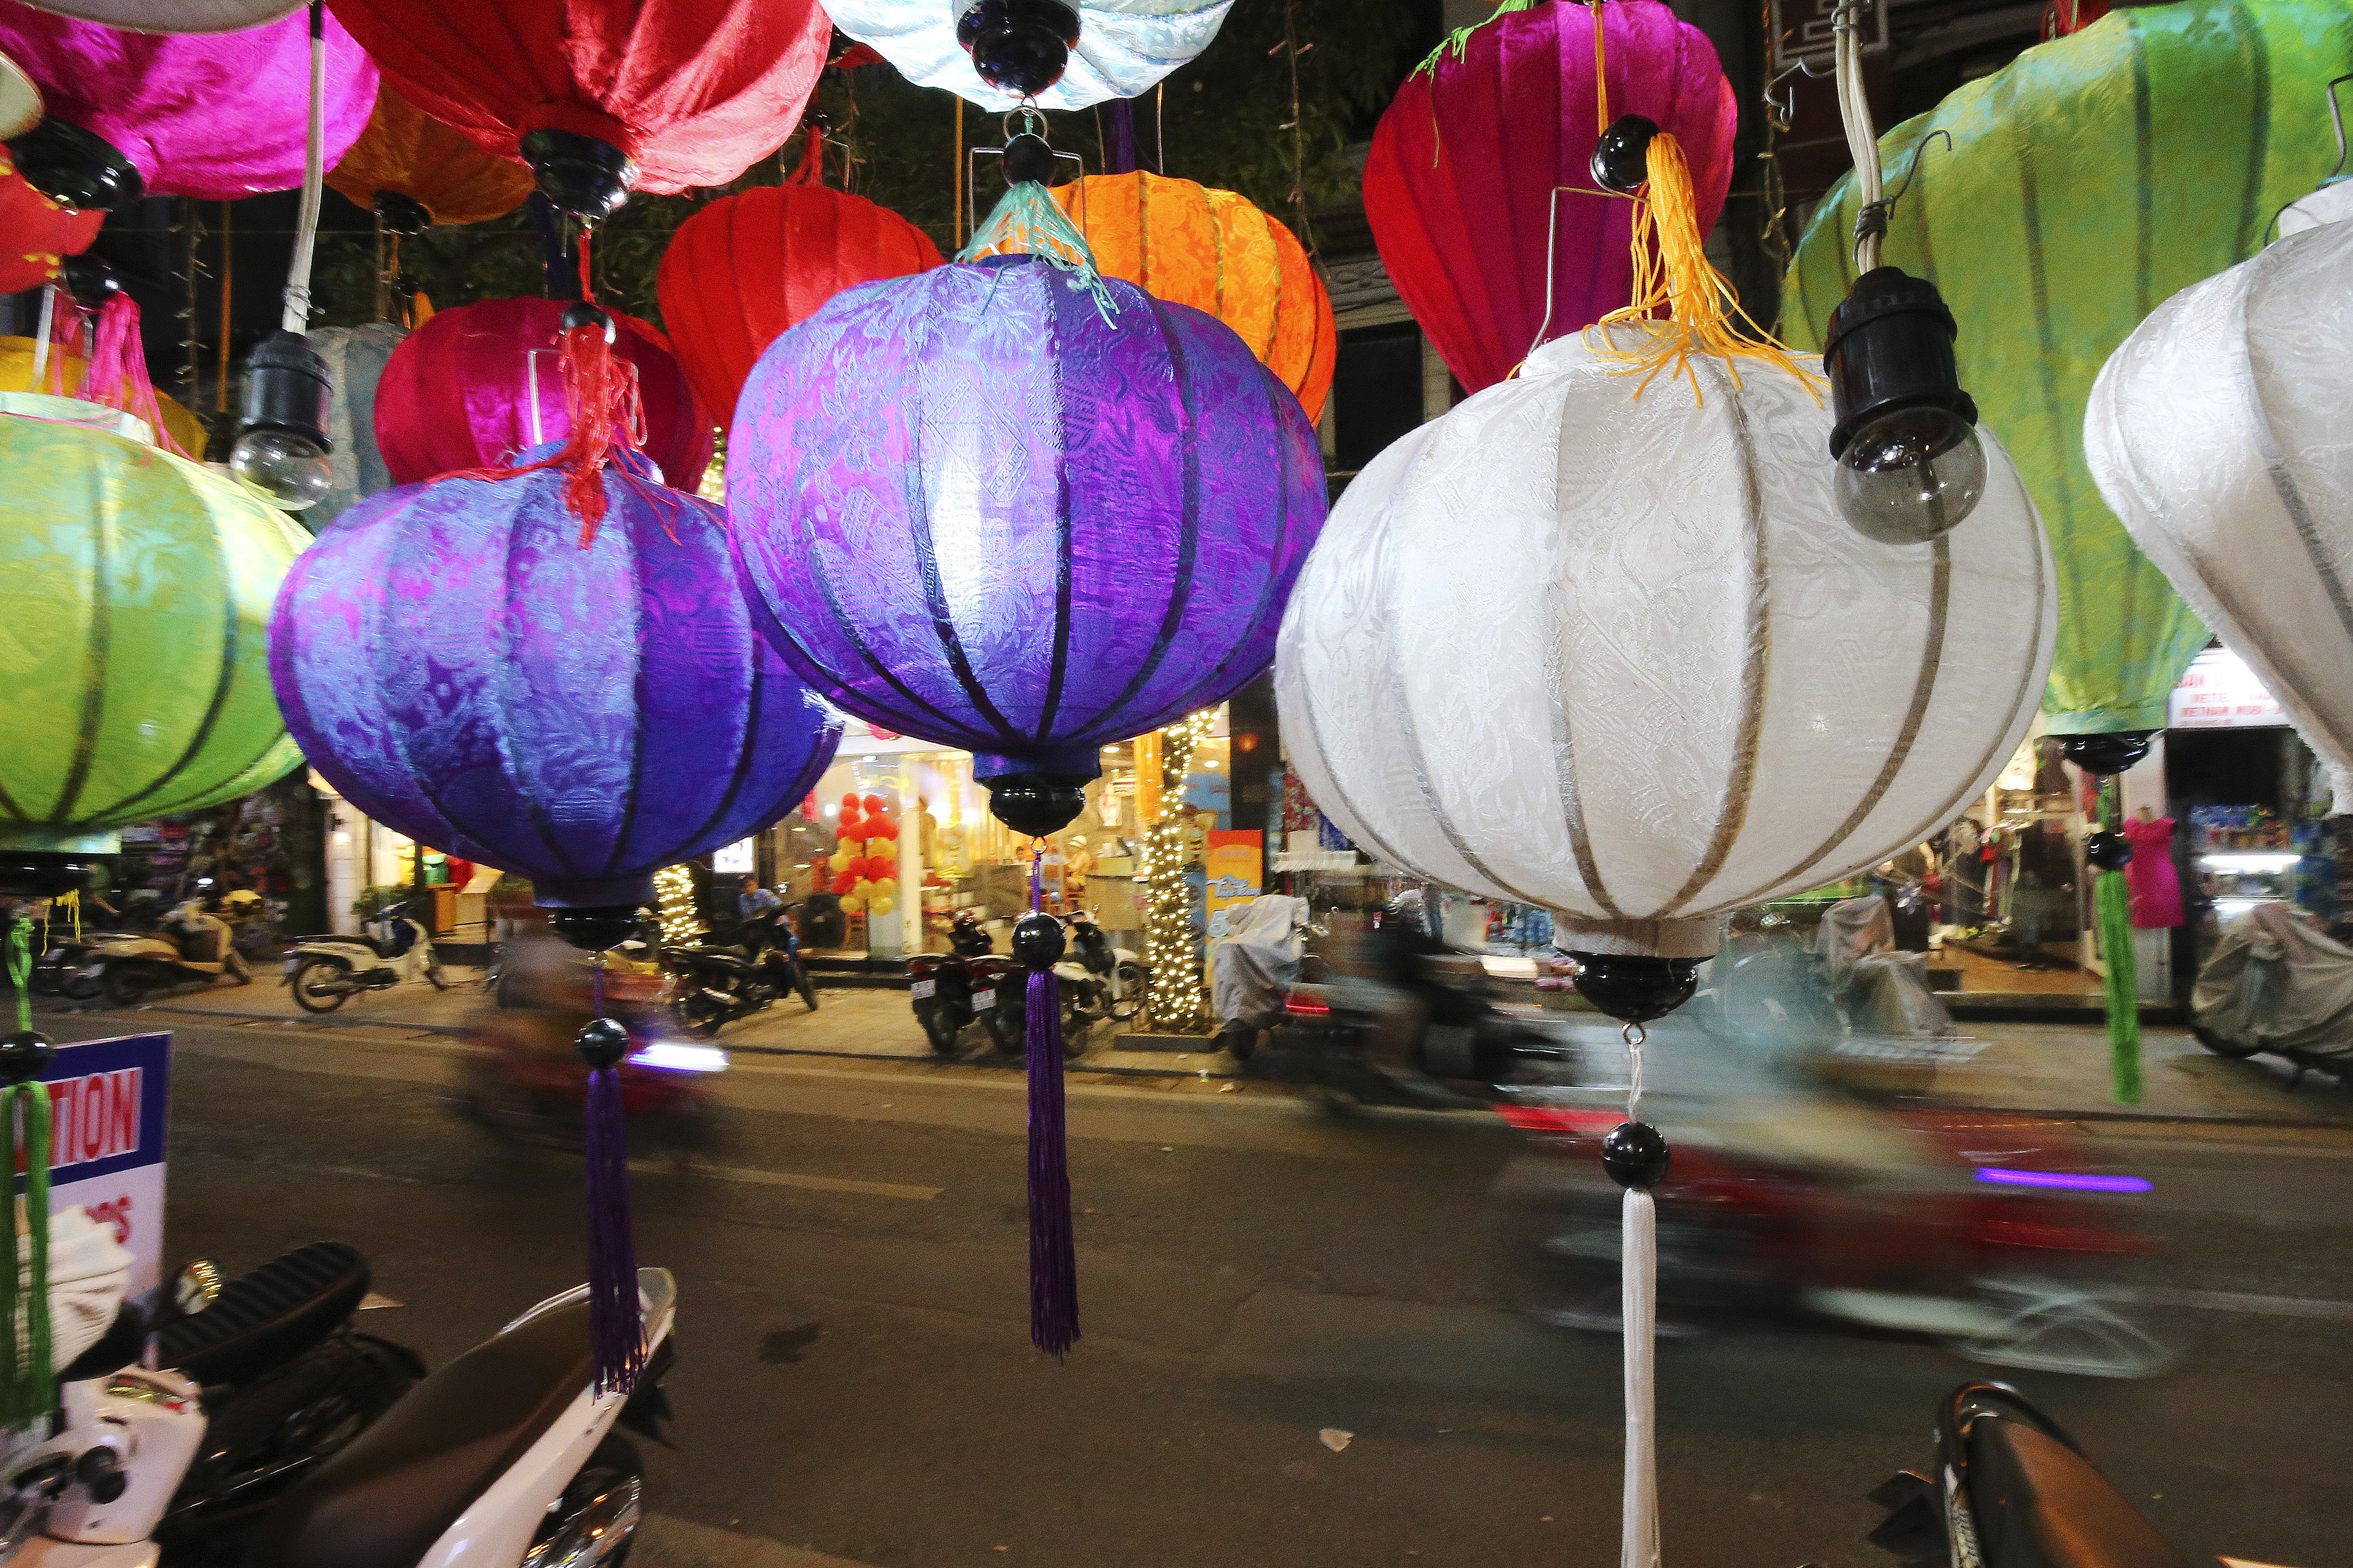 Motorists travel in Hanoi, Vietnam Apr 23, 2018.